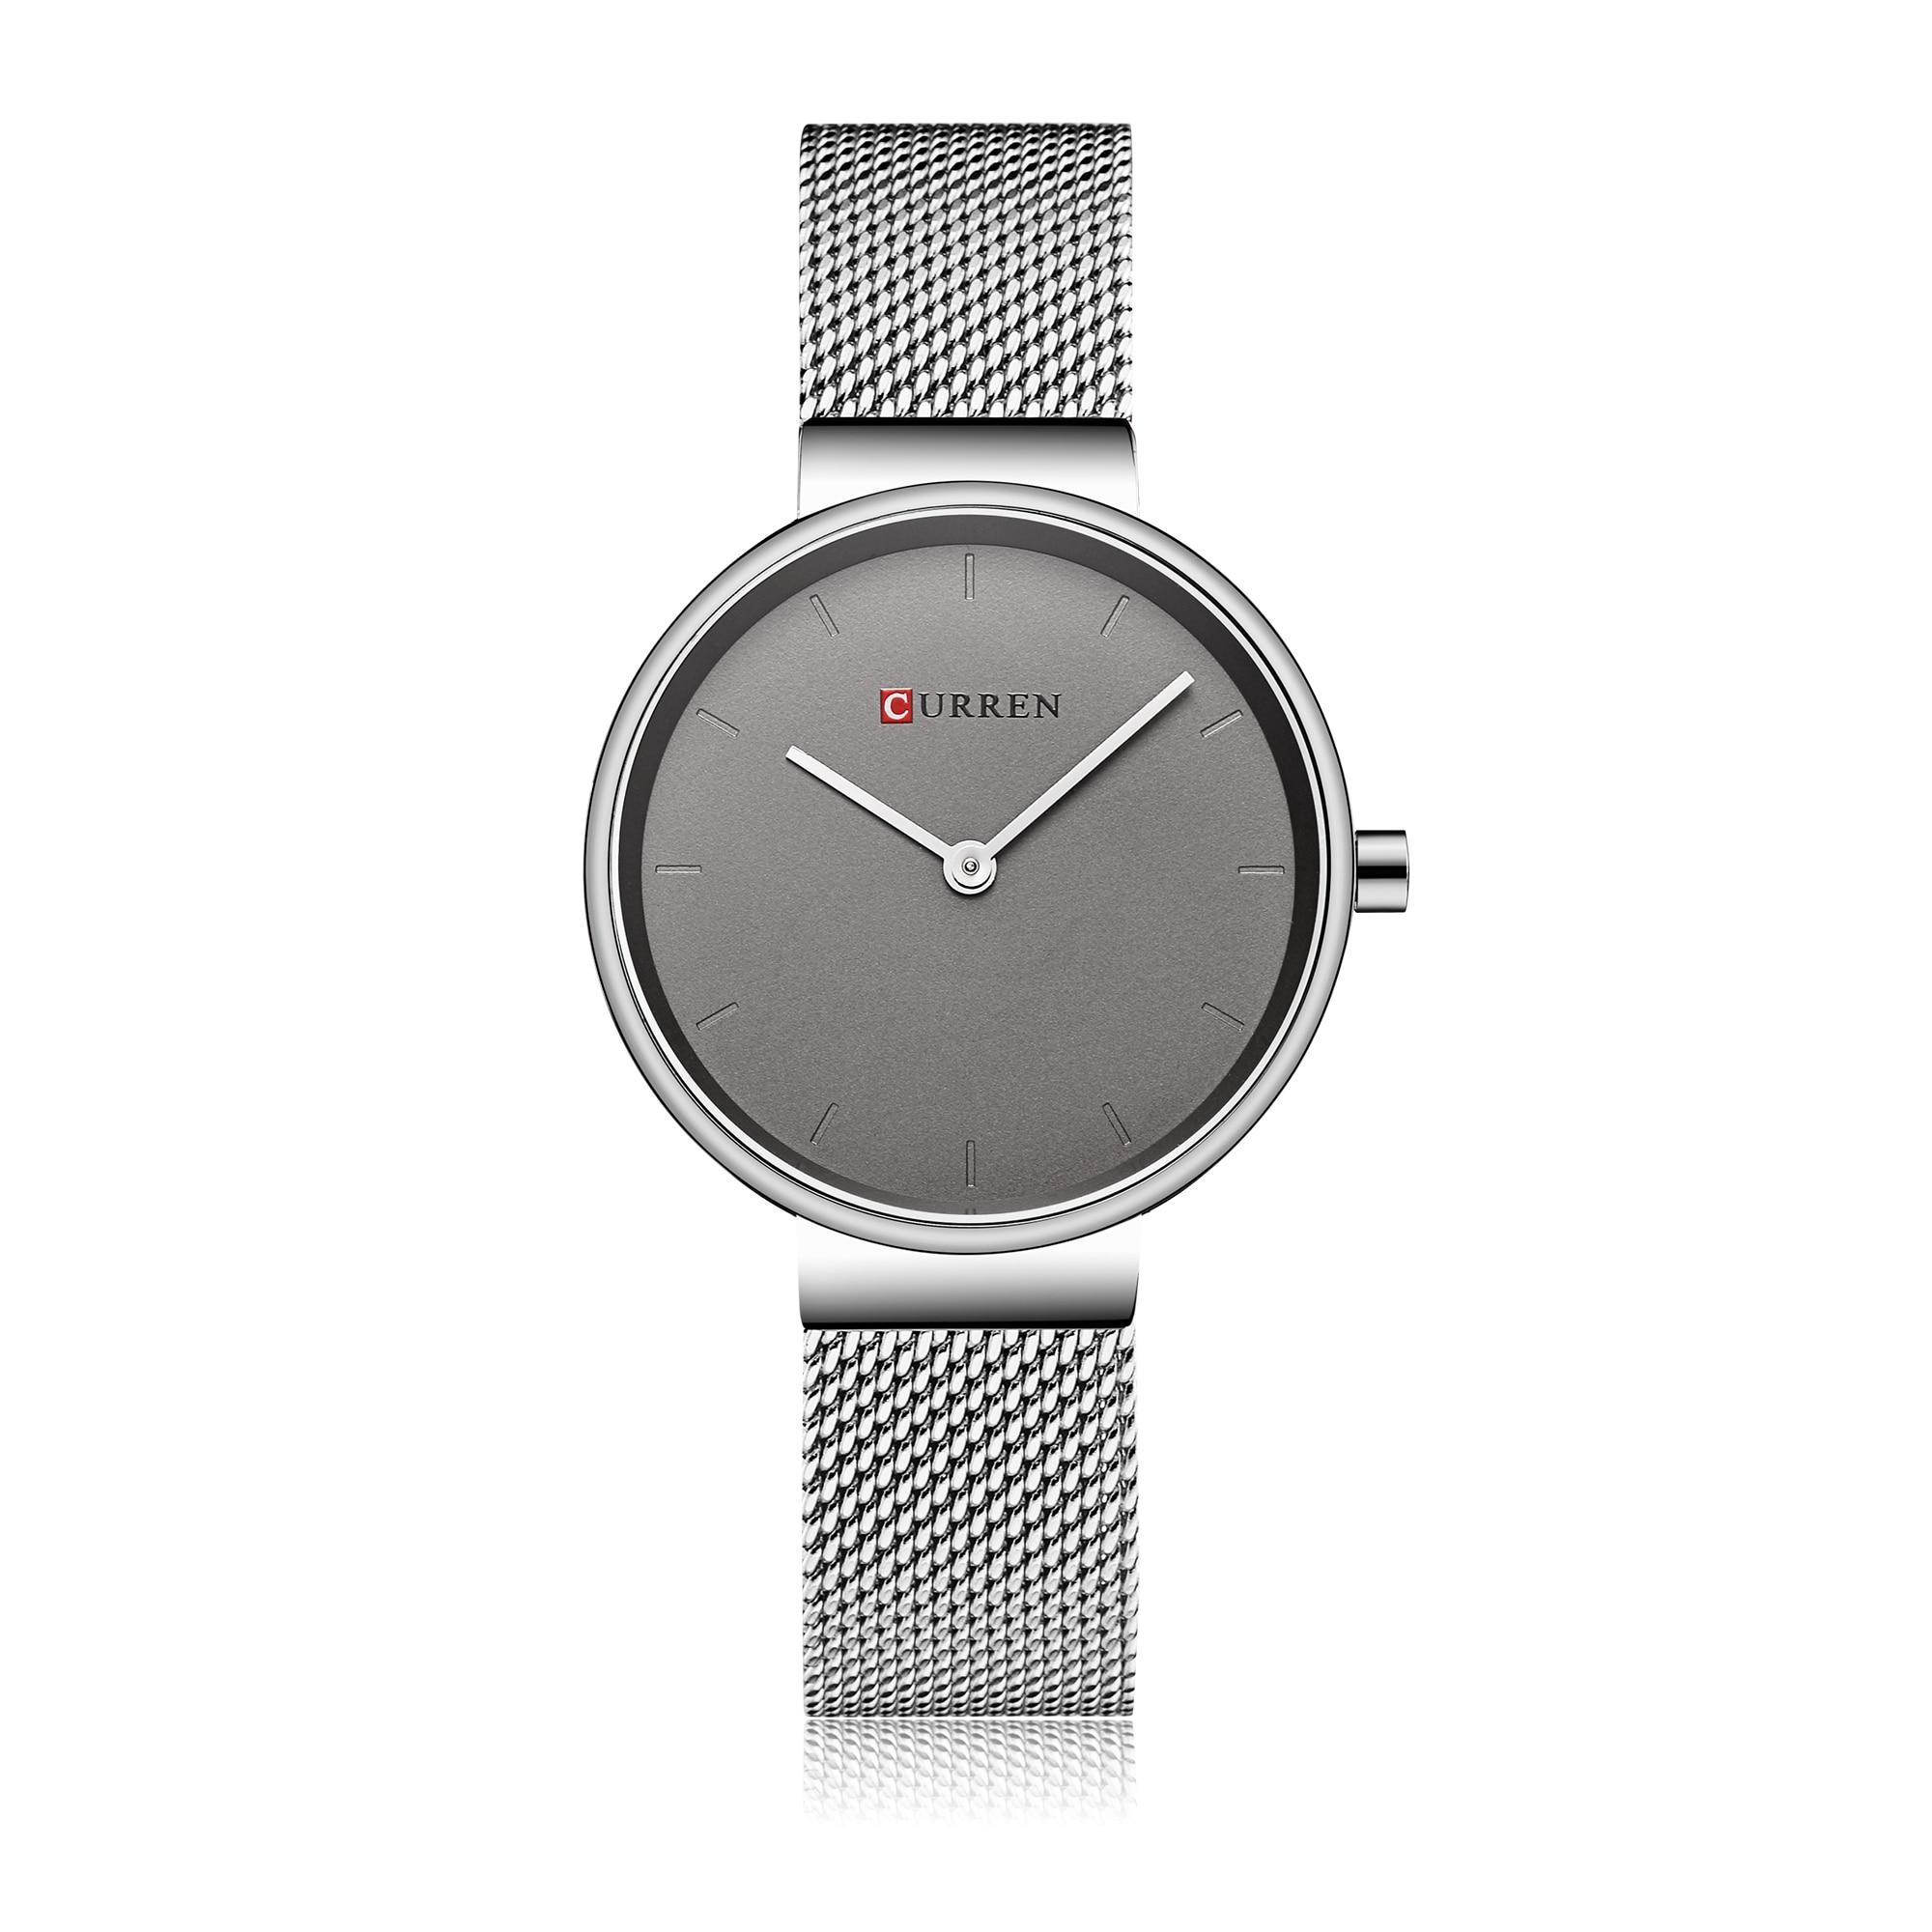 CURREN Female Watch Fashion Minimalist Style Womens Wristwatch Mesh Watch Water Resistant Hardlex Ultra Thin Relojes Para Mujer enlarge